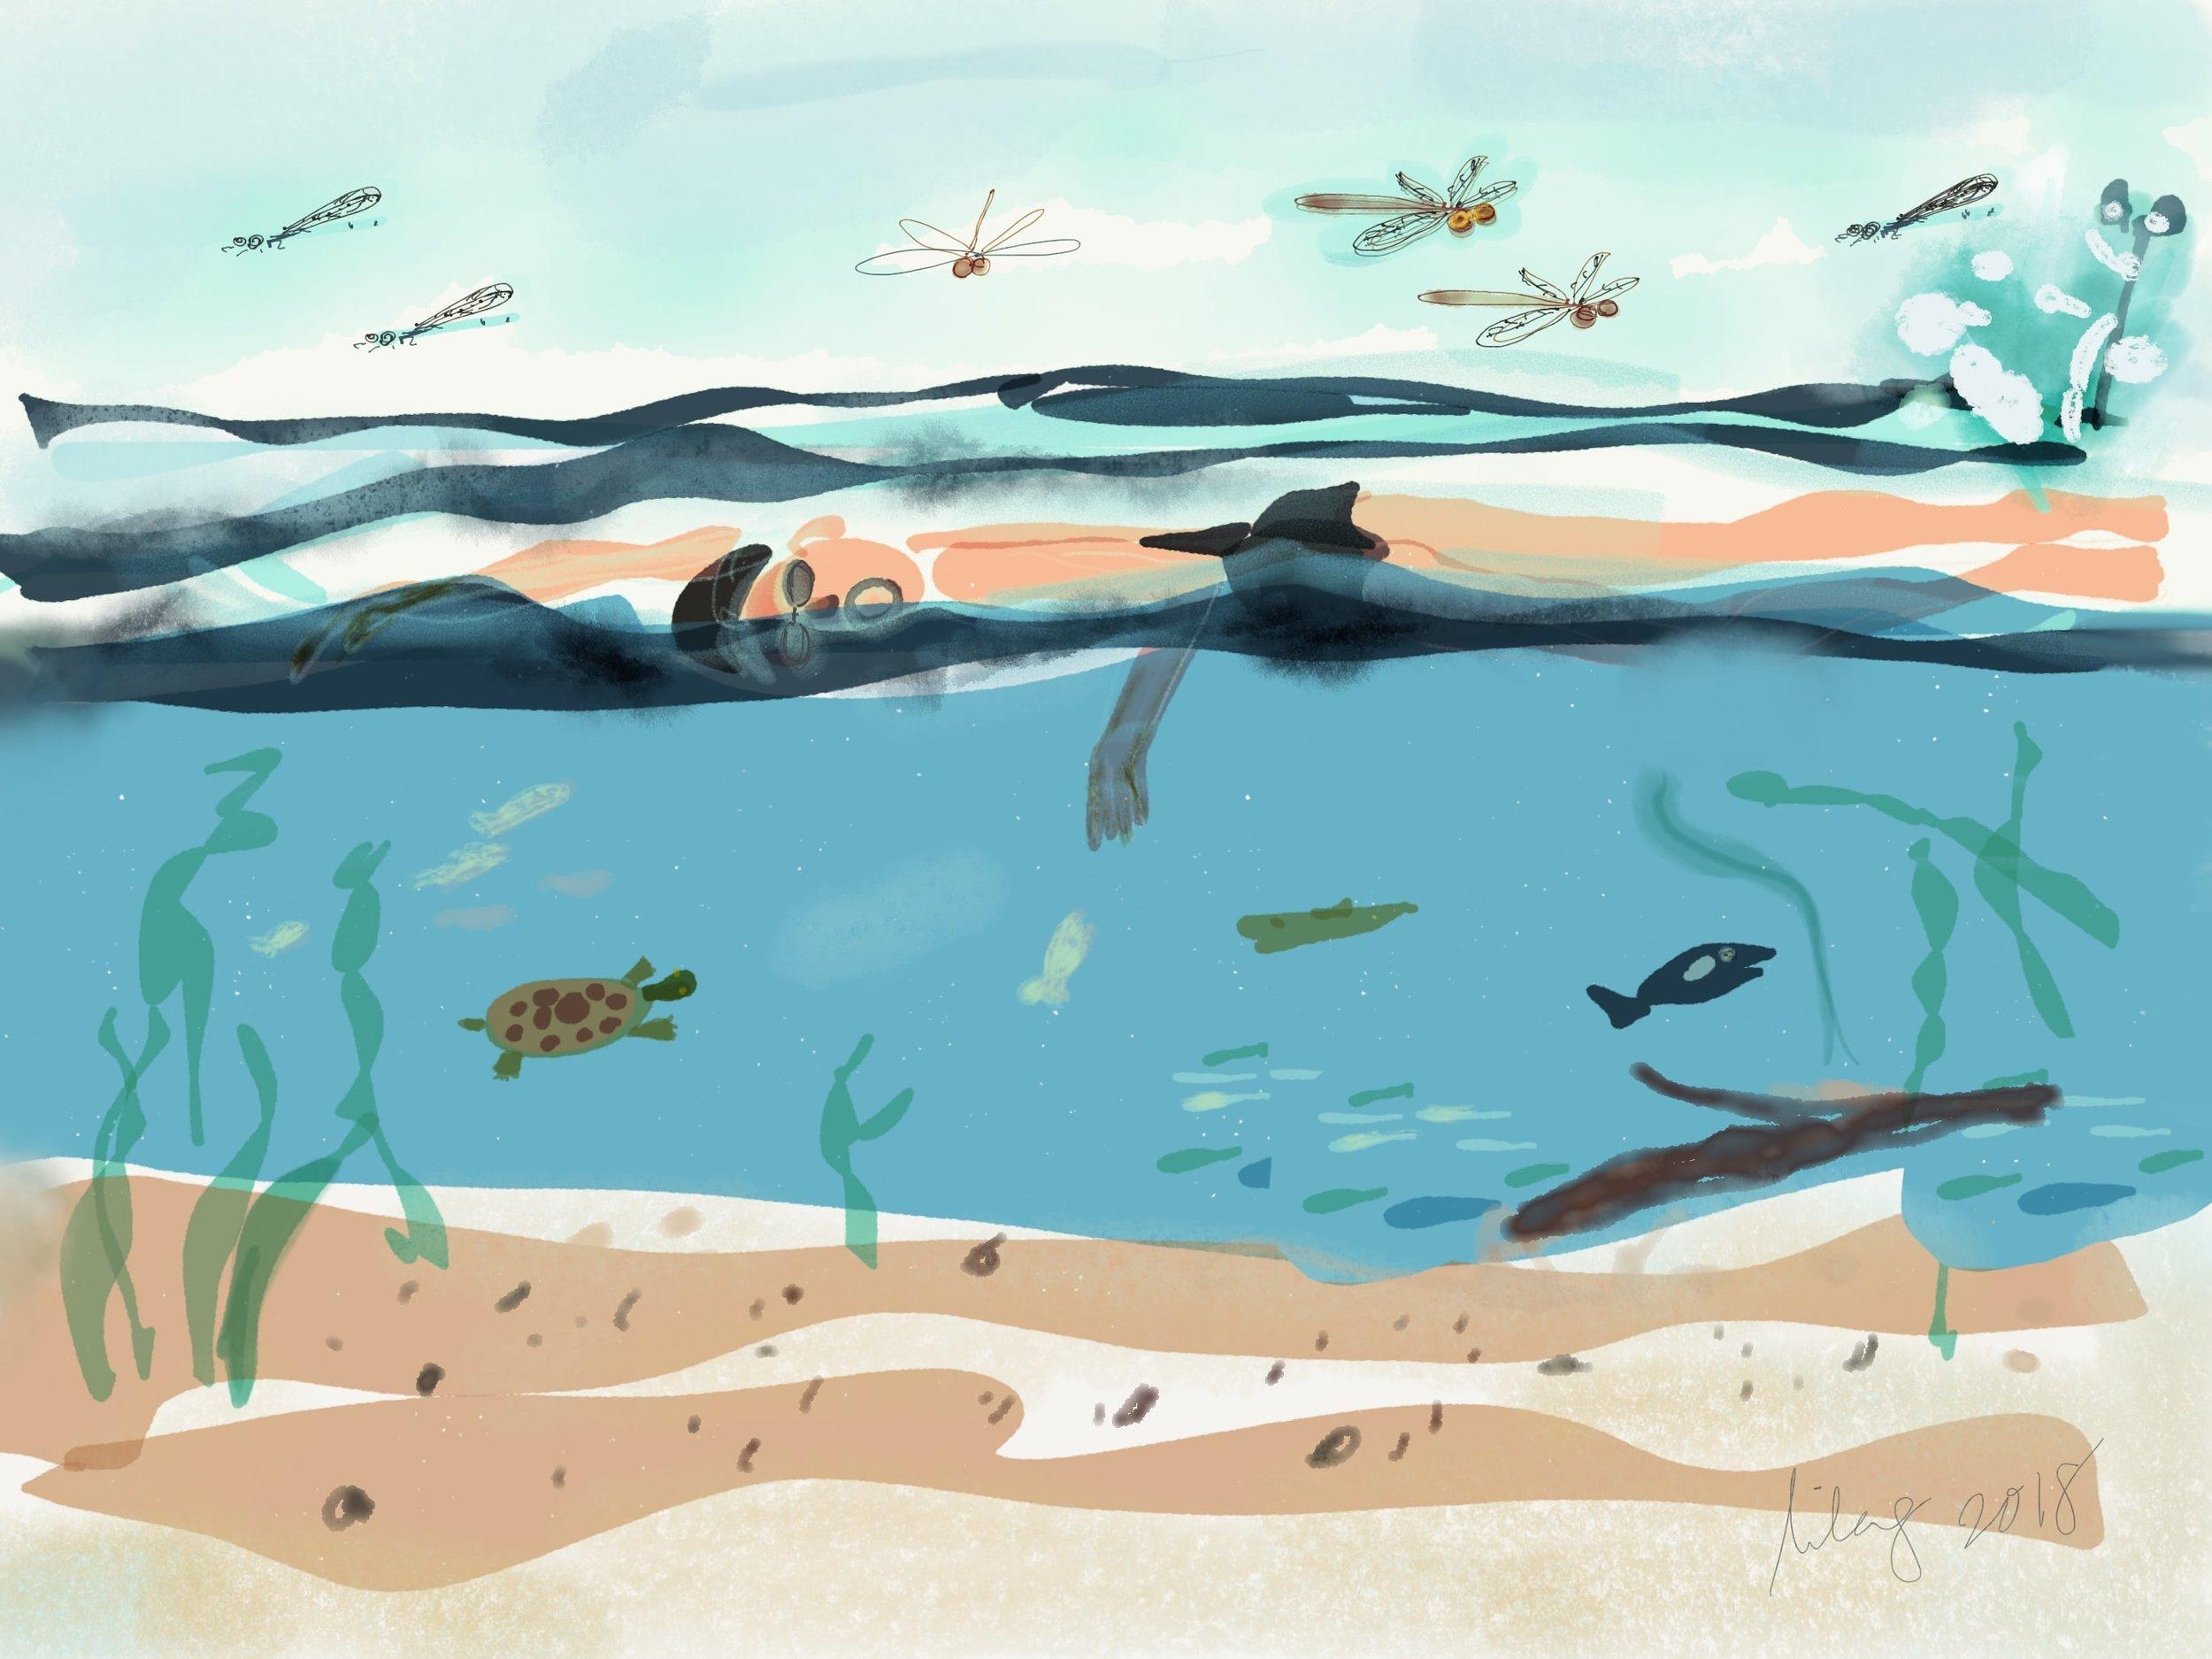 2018_august_swimmingwthedragonflies-nomi.jpg